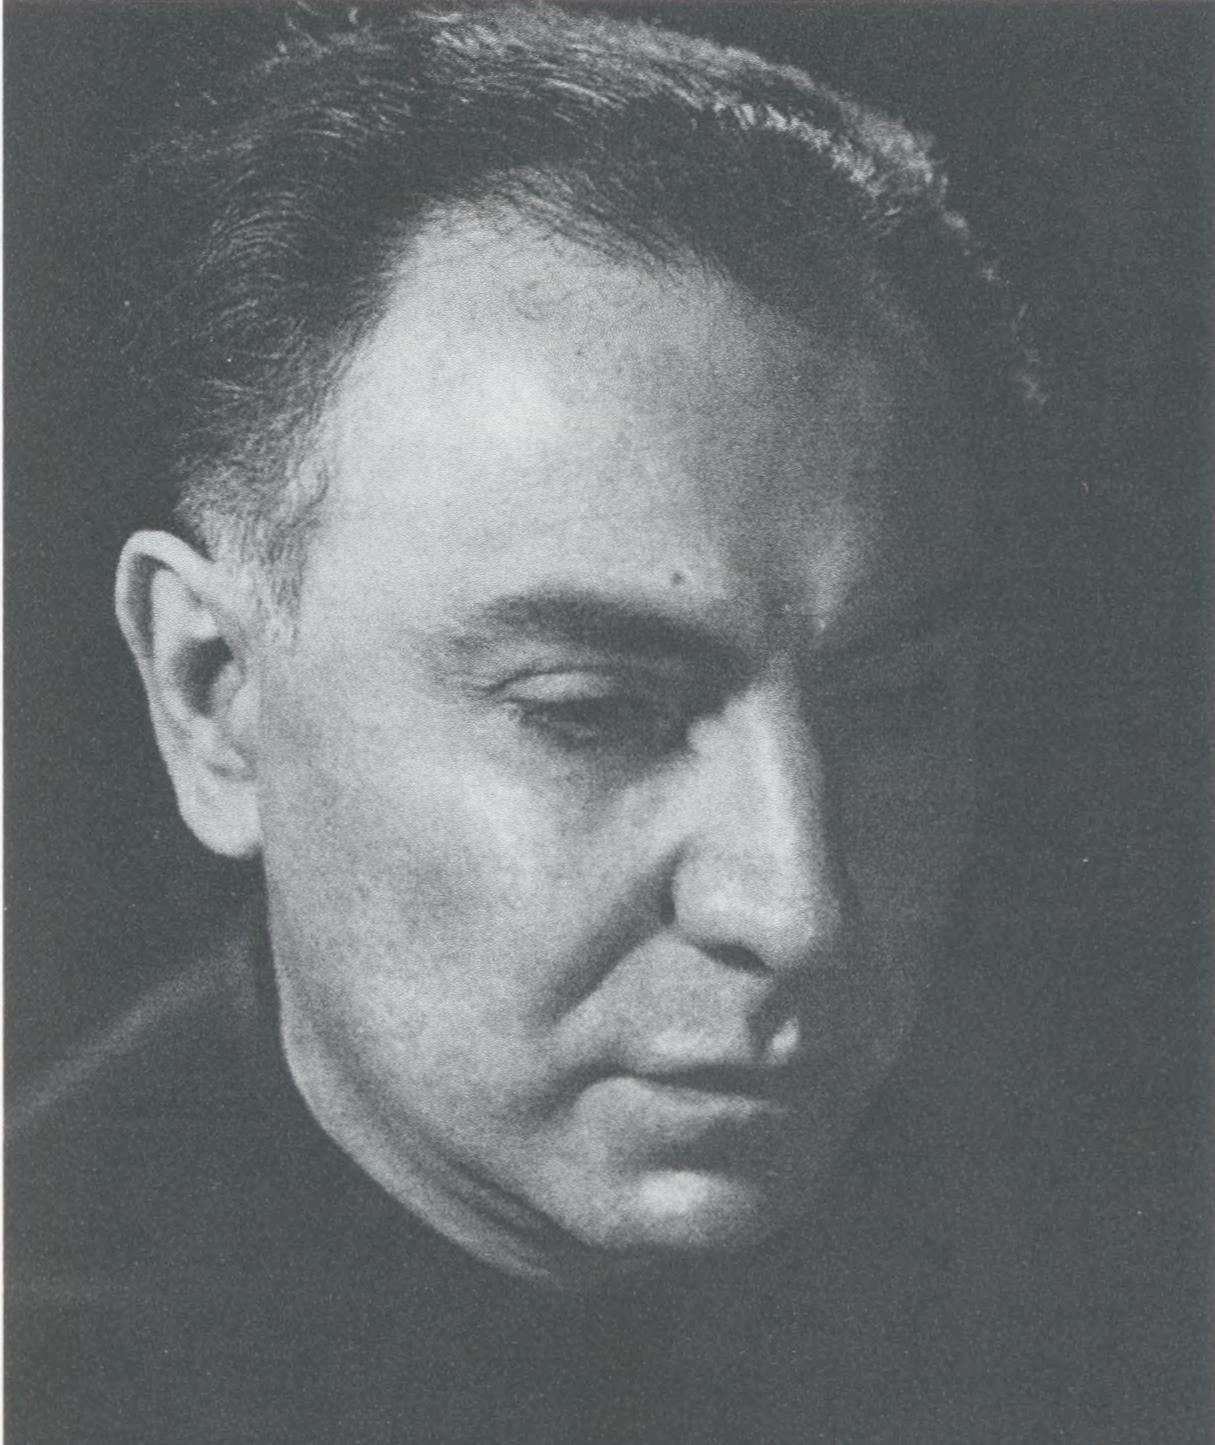 Sandor ARPAD, photographe et date exacte inconnus, probablement vers 1957